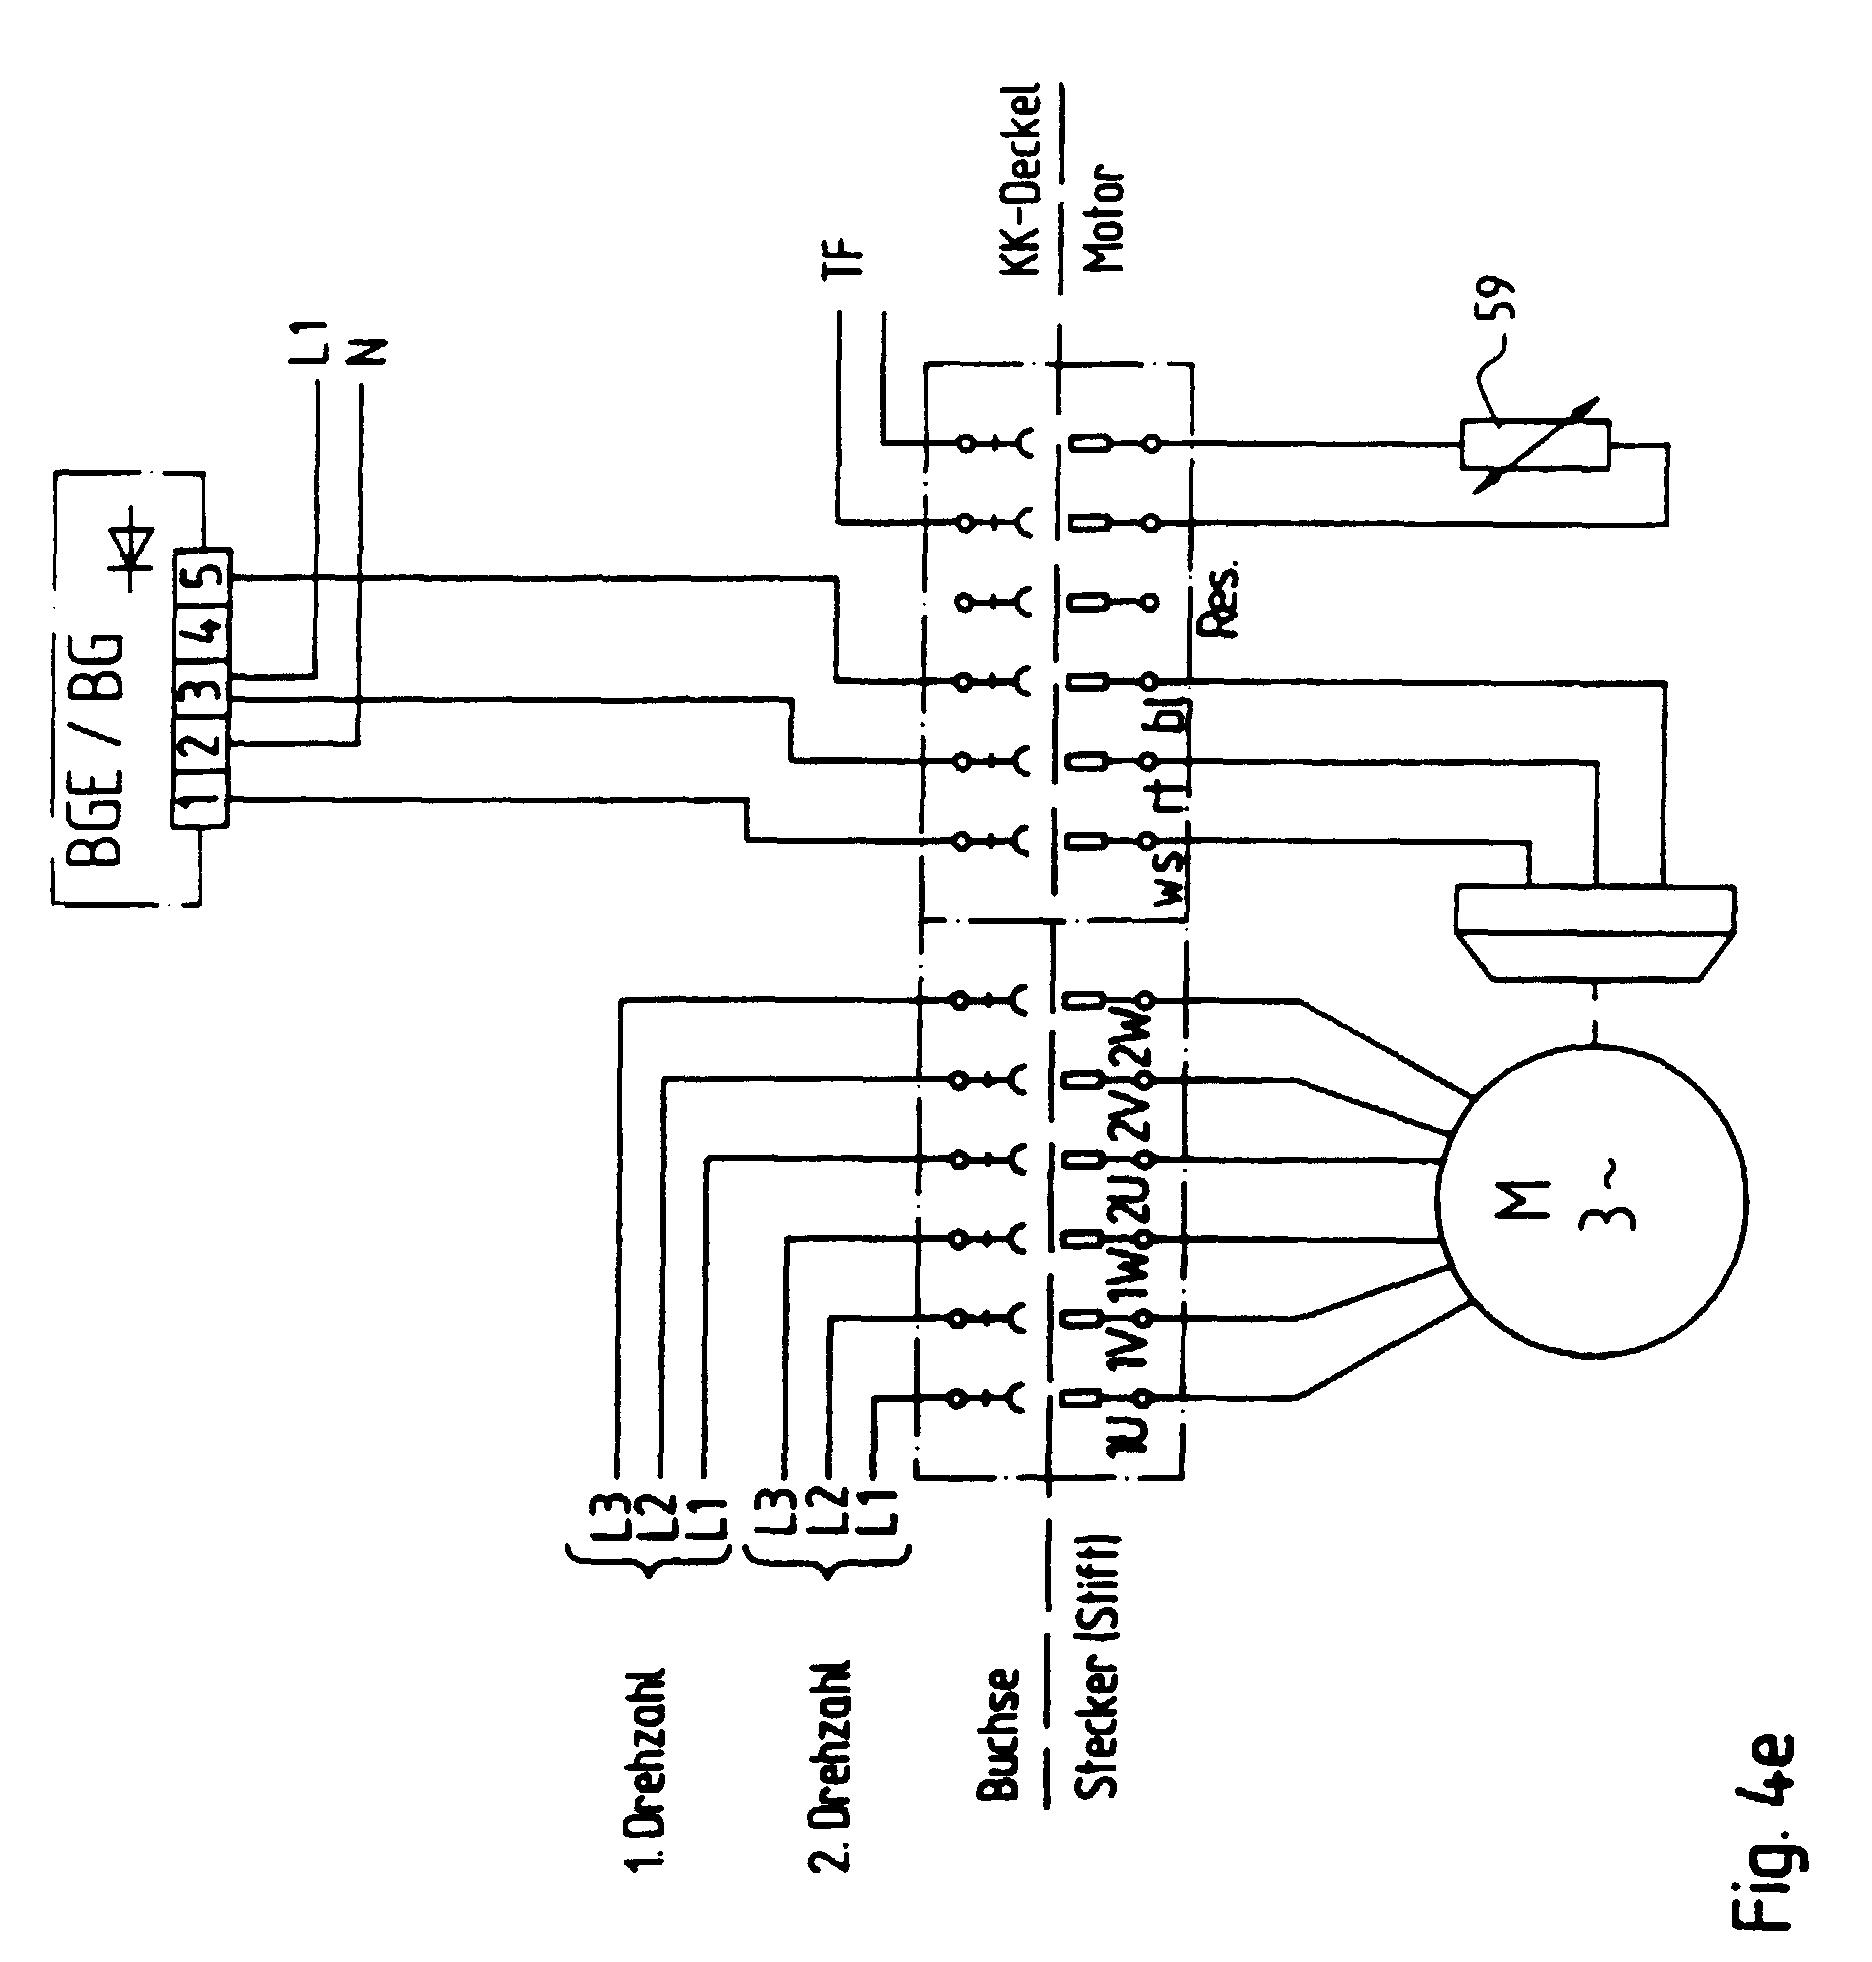 Patent Ep0582777b1